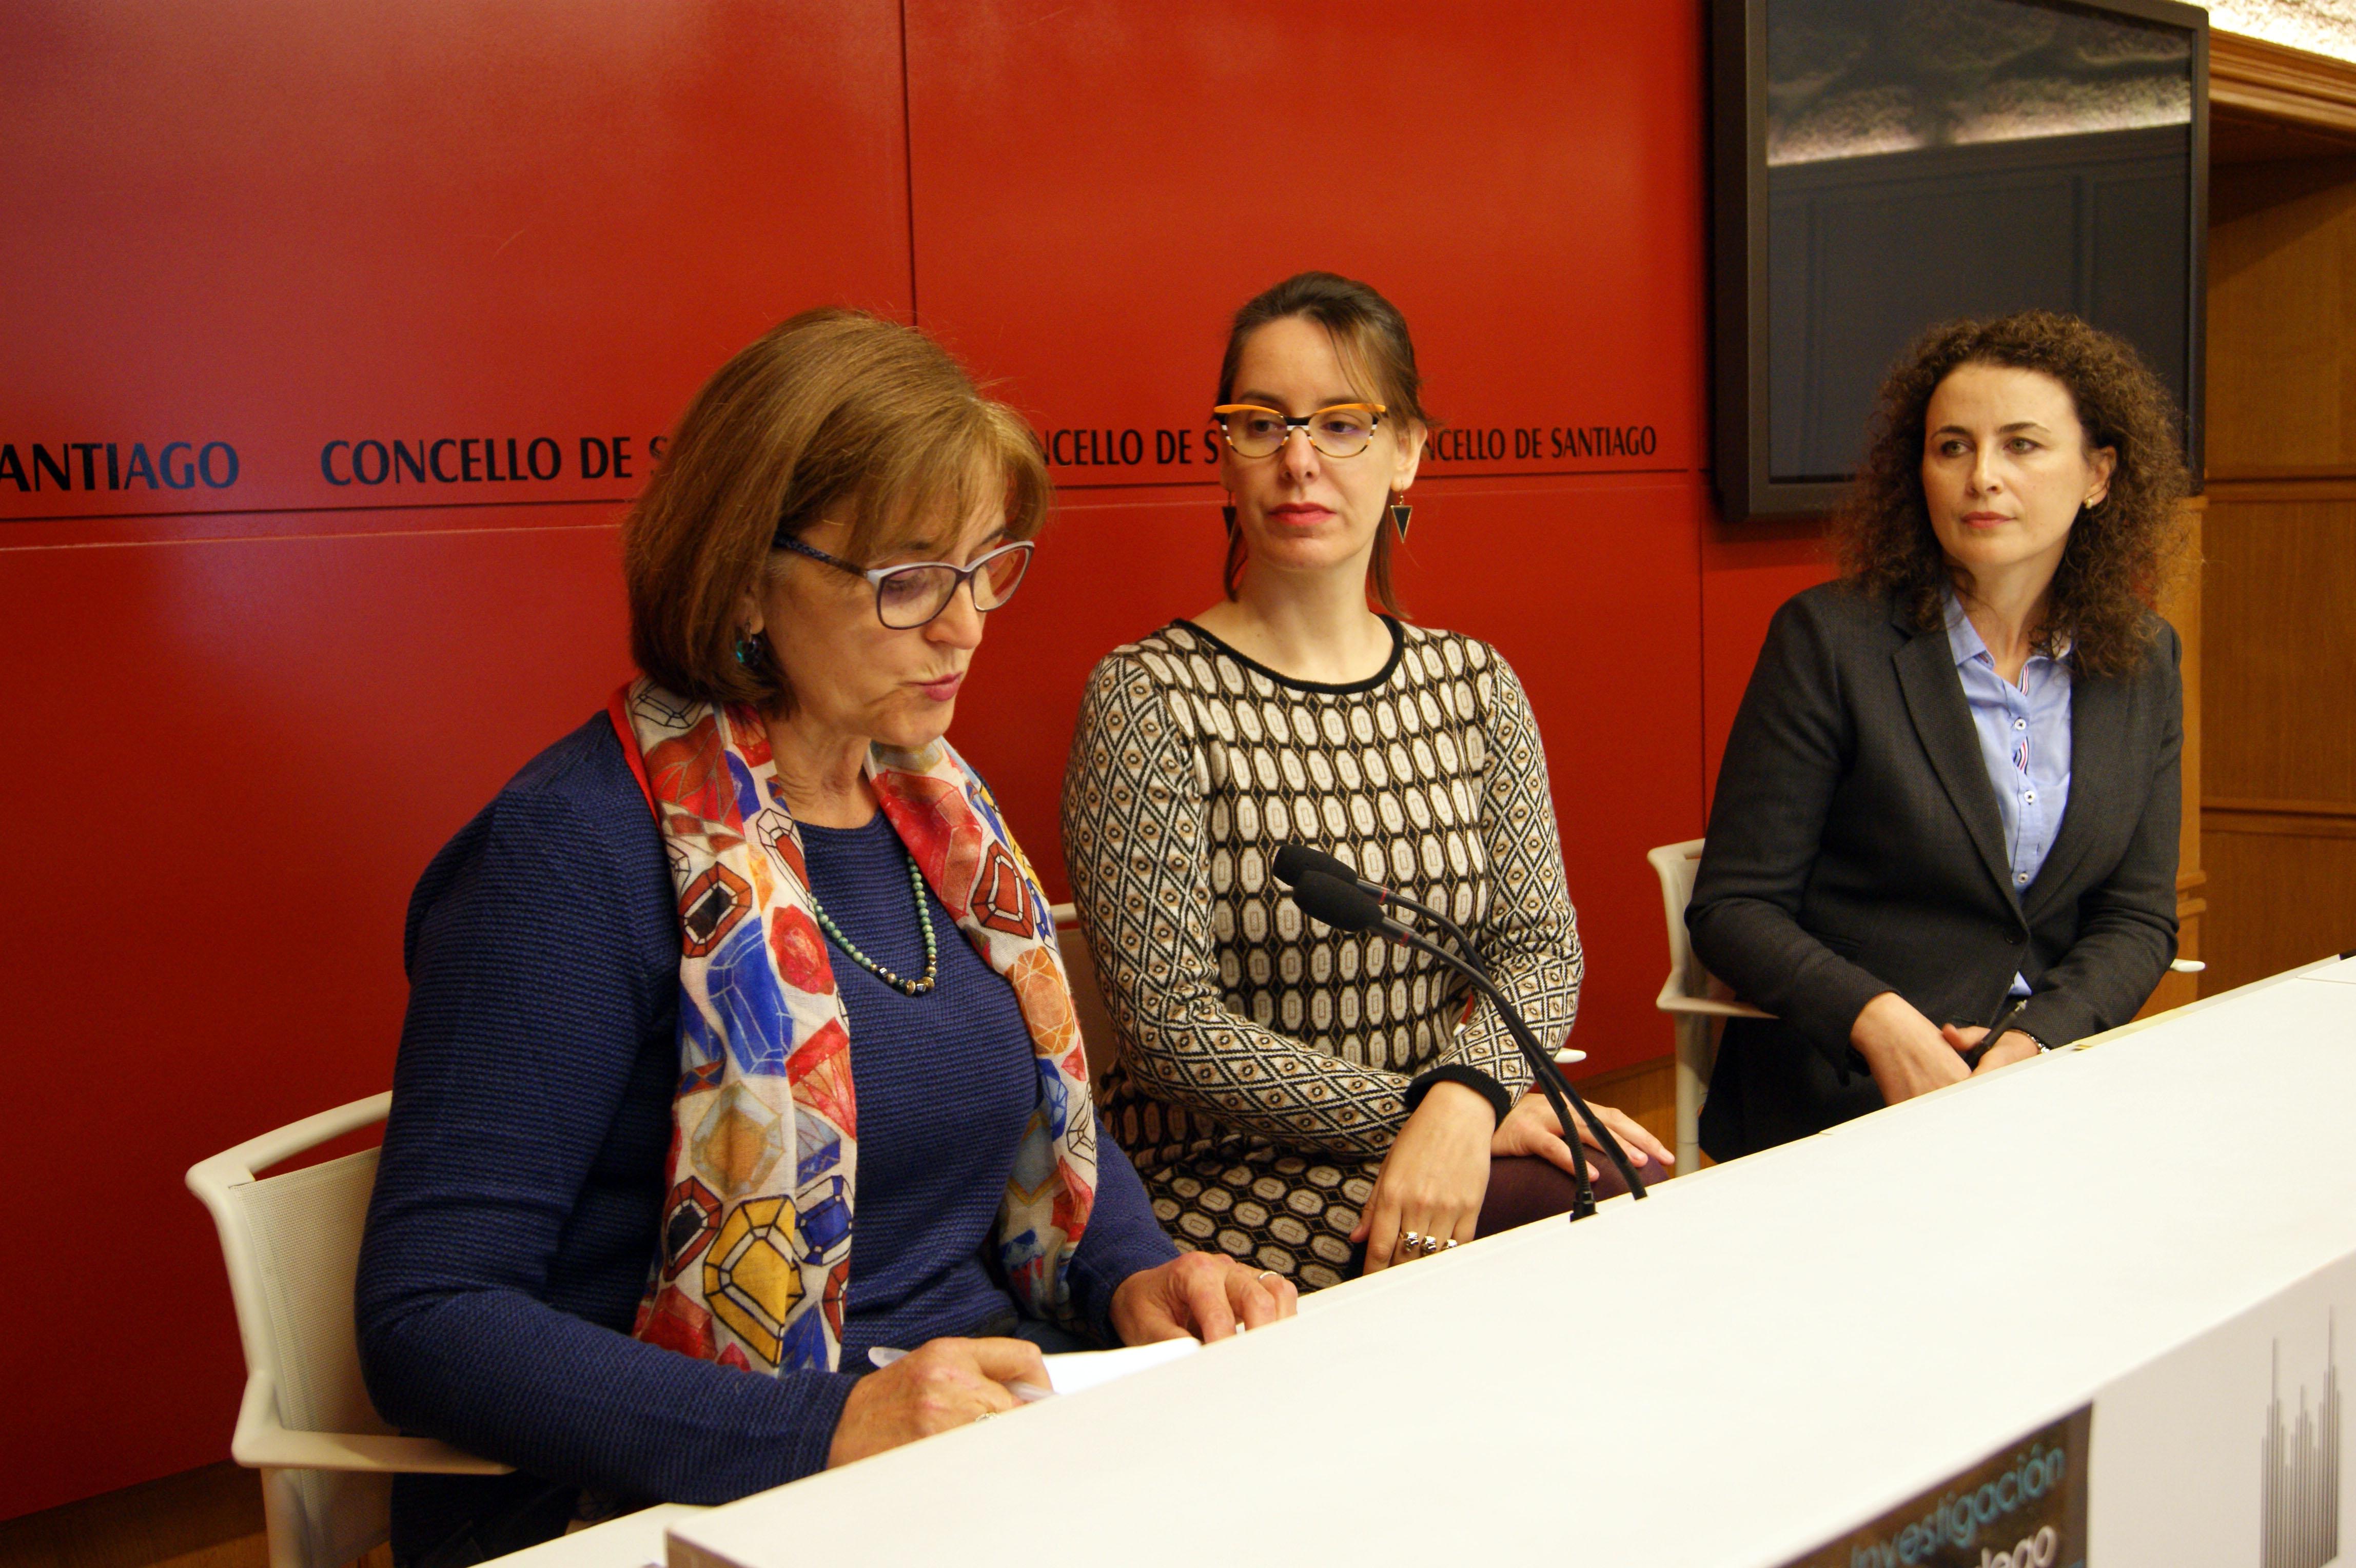 Pilar Astray, Branca Novoneyra e Eva Calvo presentaron a convocatoria.